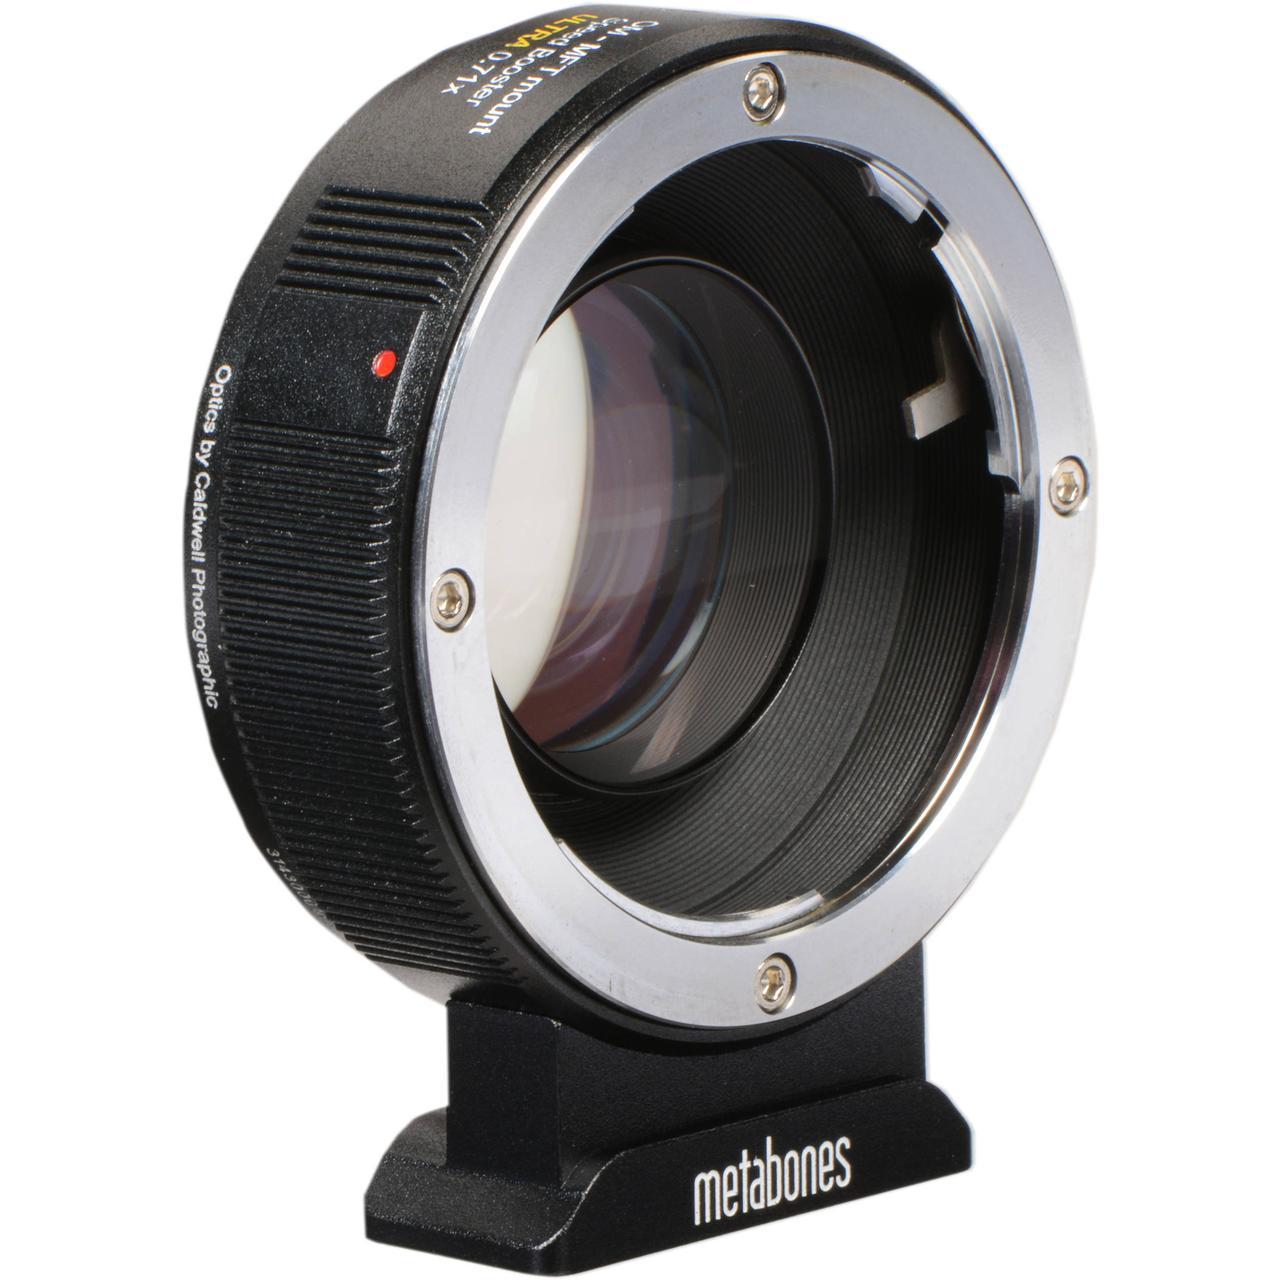 Metabones Ultra 0 71x Adapter for Olympus OM-Mount Lens to Micro Four  Thirds-Mount Camera (MB_SPOM-M43-BM3): продажа, цена в Киеве  конвертеры,